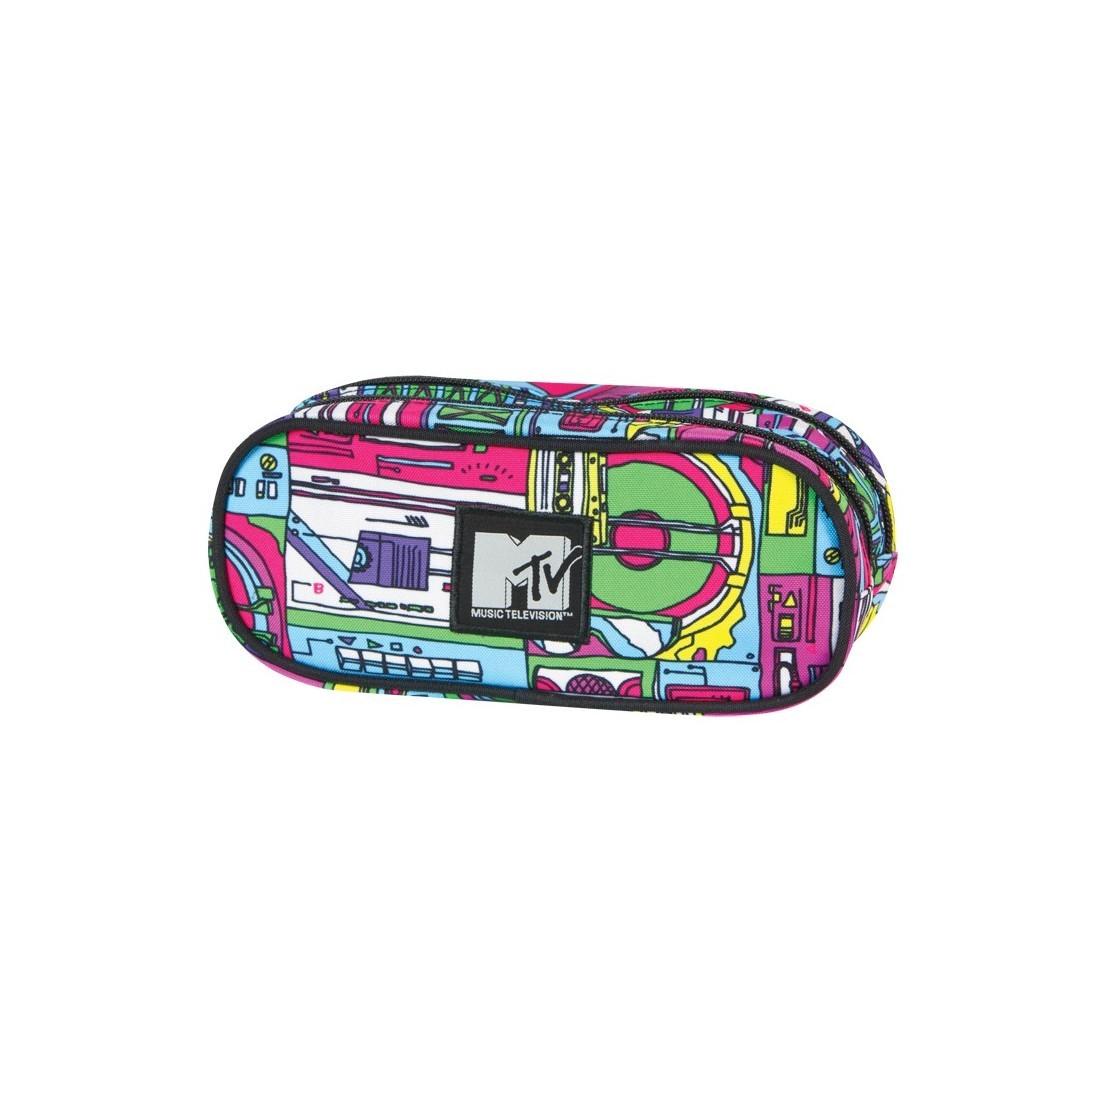 Piórnik Coolpack Podwójny MTV Music - plecak-tornister.pl